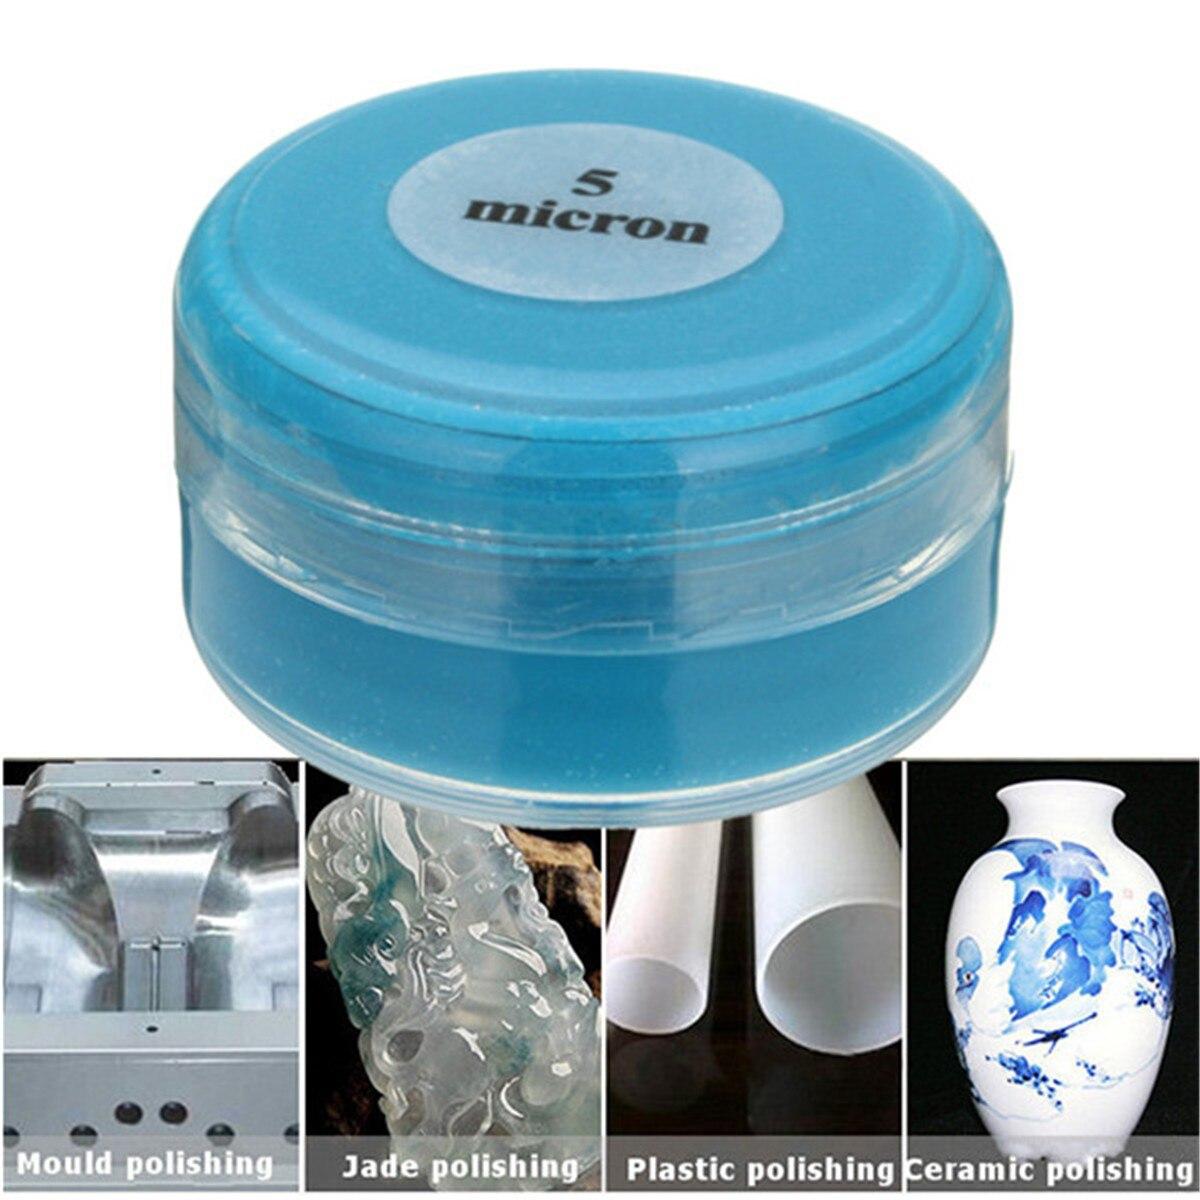 20g/box 5 Micron Diamond Polishing Lapping Paste Pastes Compound  Metal Grinding Polishing Abrasive Tools Emerald Agate Crystal